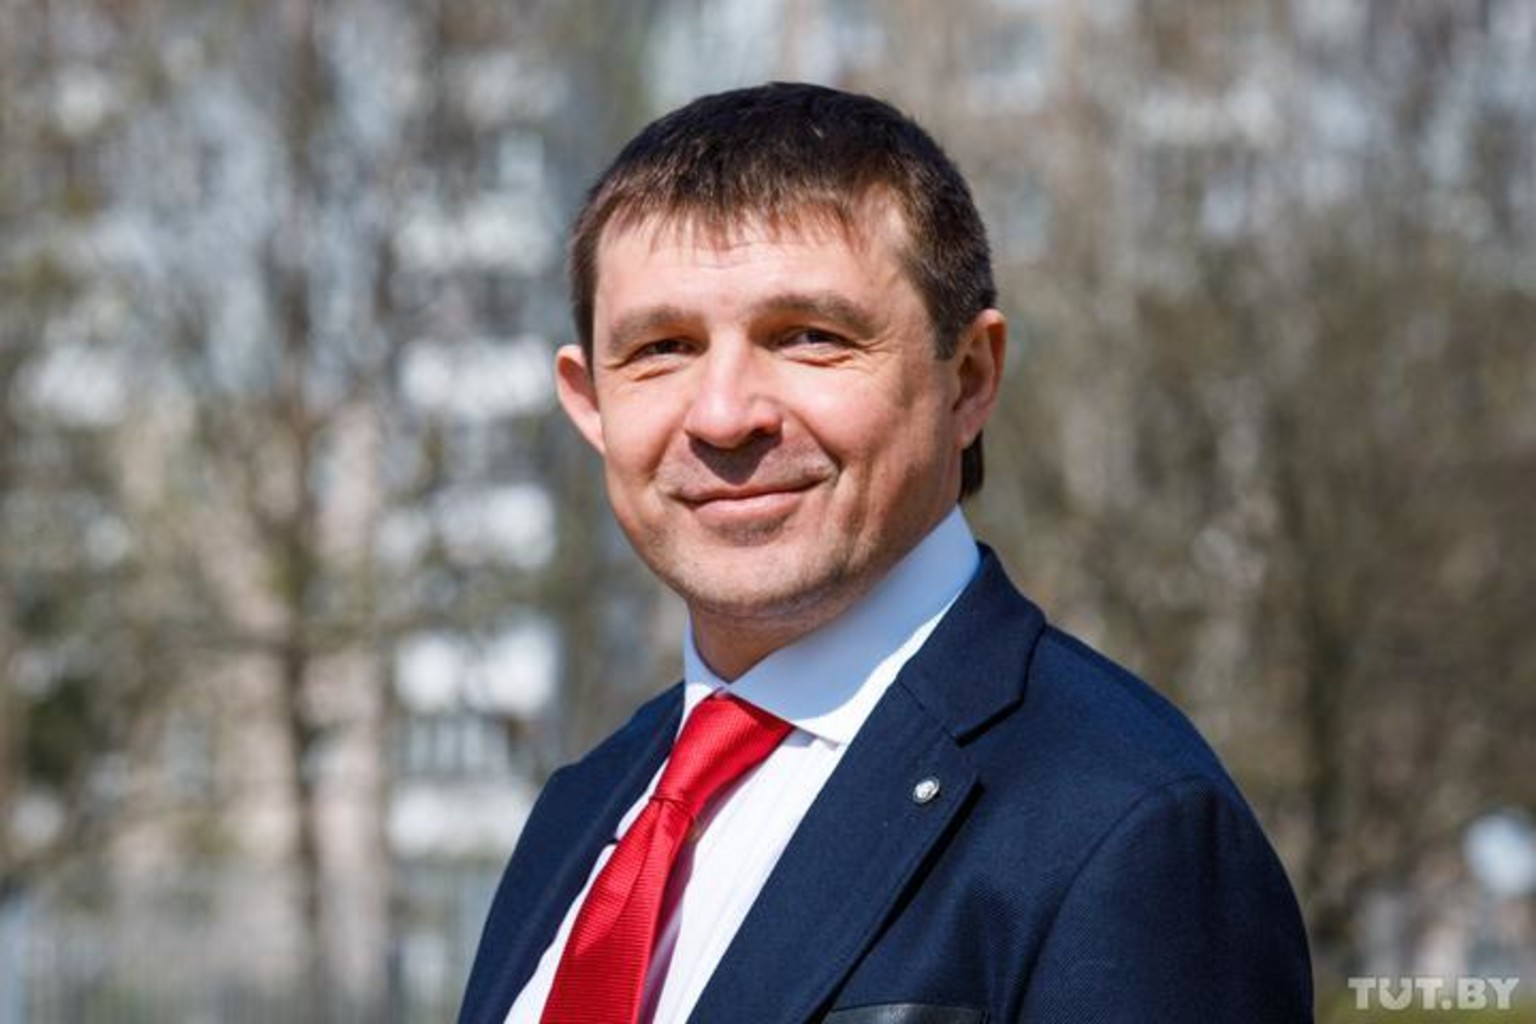 Kutuzov 20180421 sdm tutby phsl img 9724